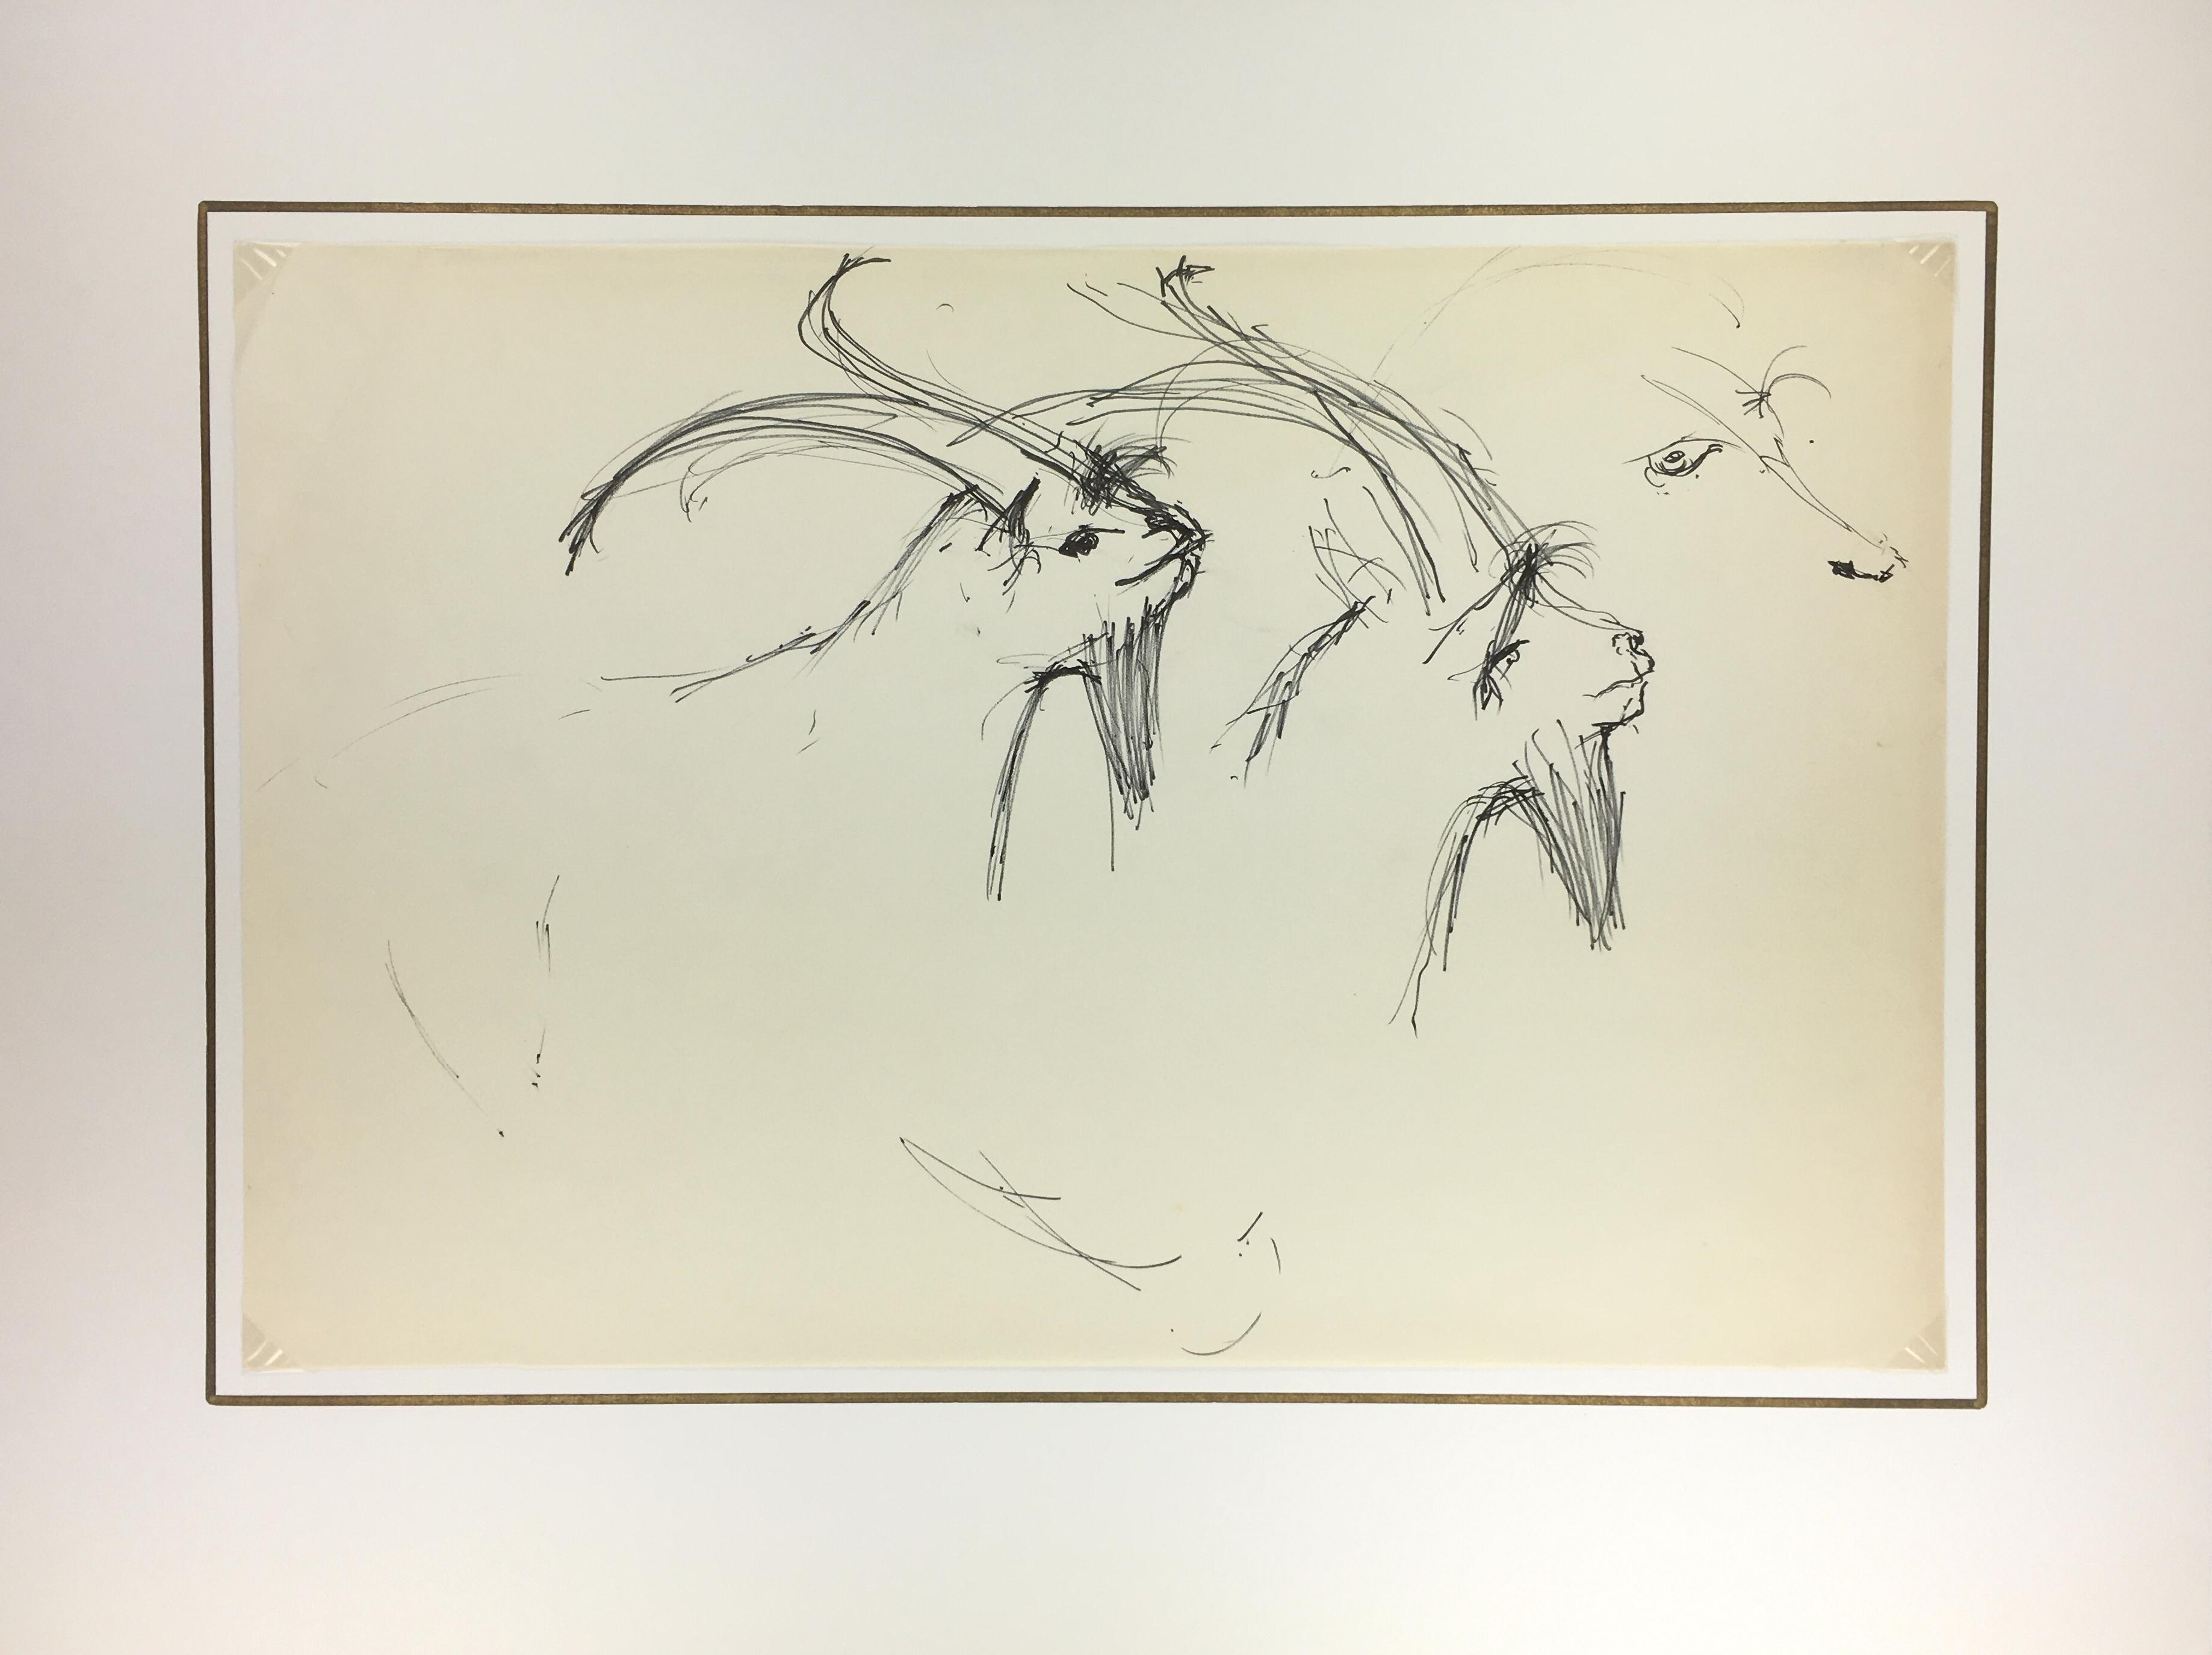 Animals Original Art - Goats, Schwerb, c.1960